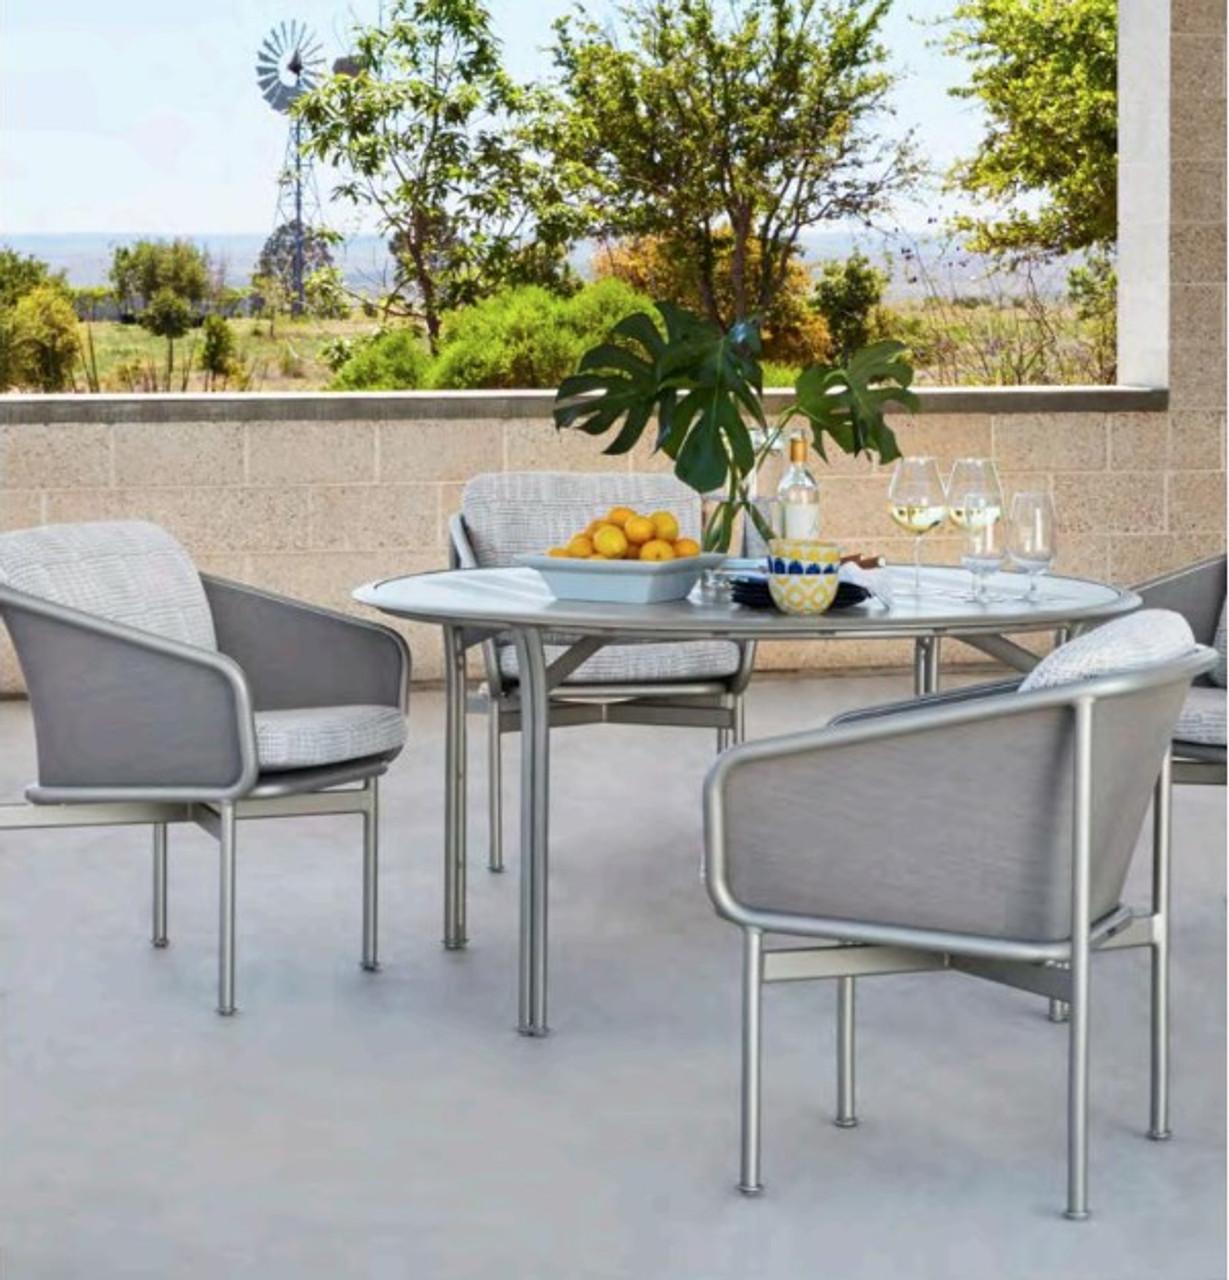 Astonishing Verge Collection Brown Jordan Outdoor Patio Furniture Best Image Libraries Barepthycampuscom